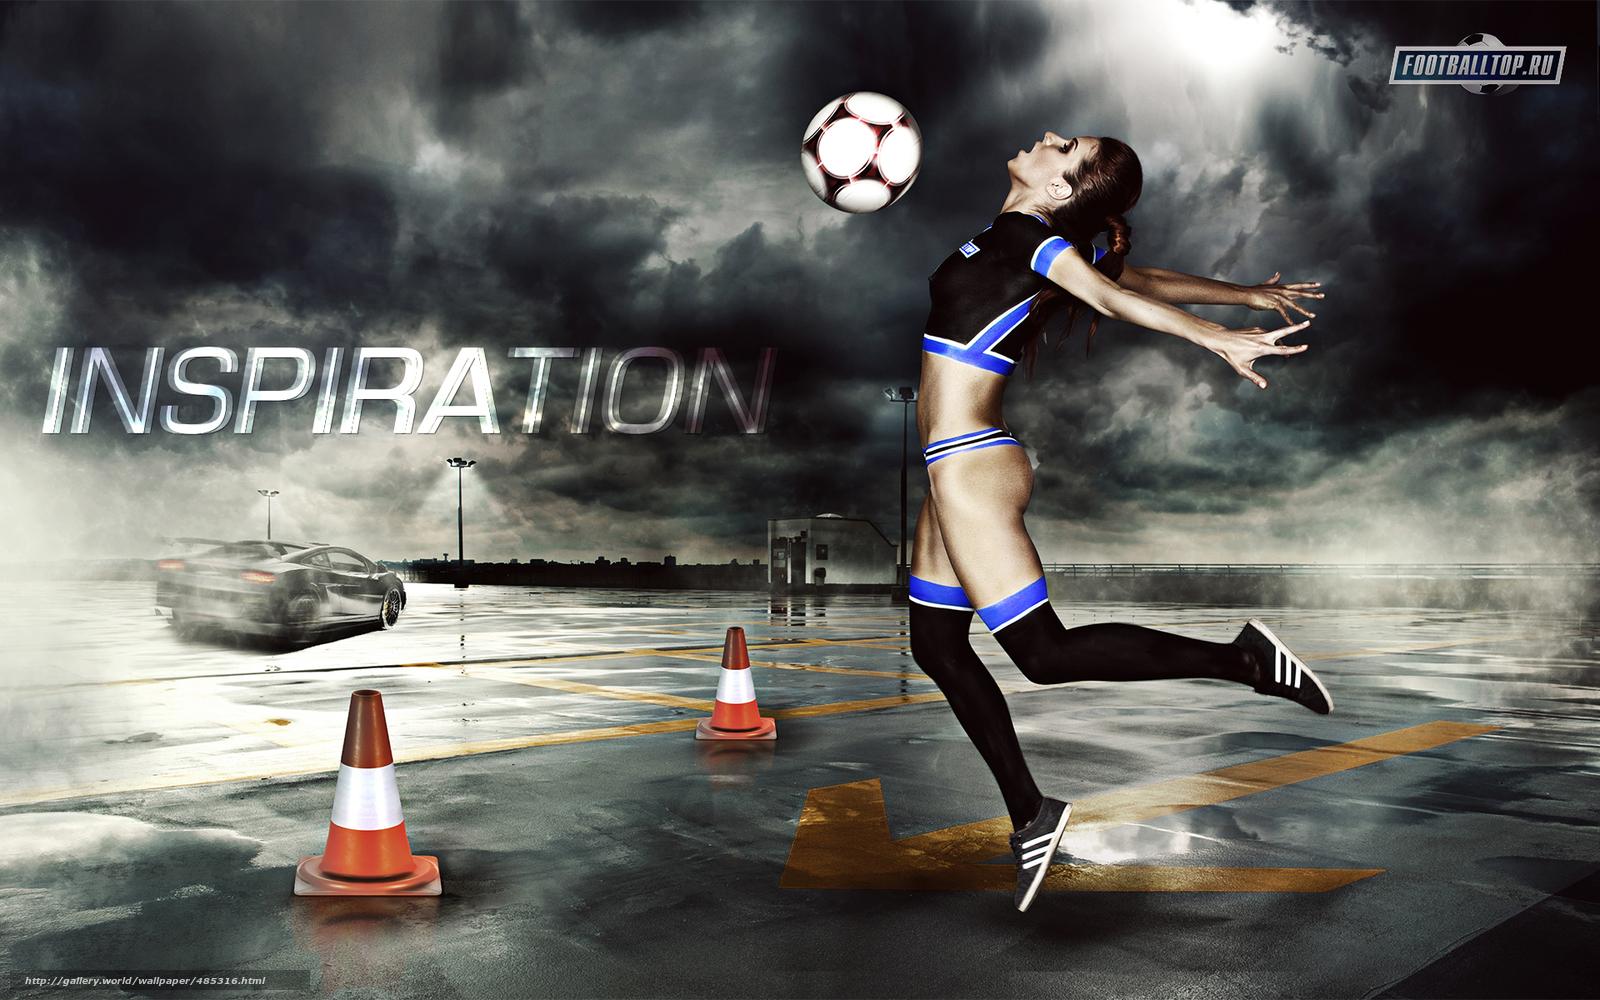 Soccer Girls Wallpaper Free: Tlcharger Fond D'ecran Sport, Football, Les Filles Fonds D